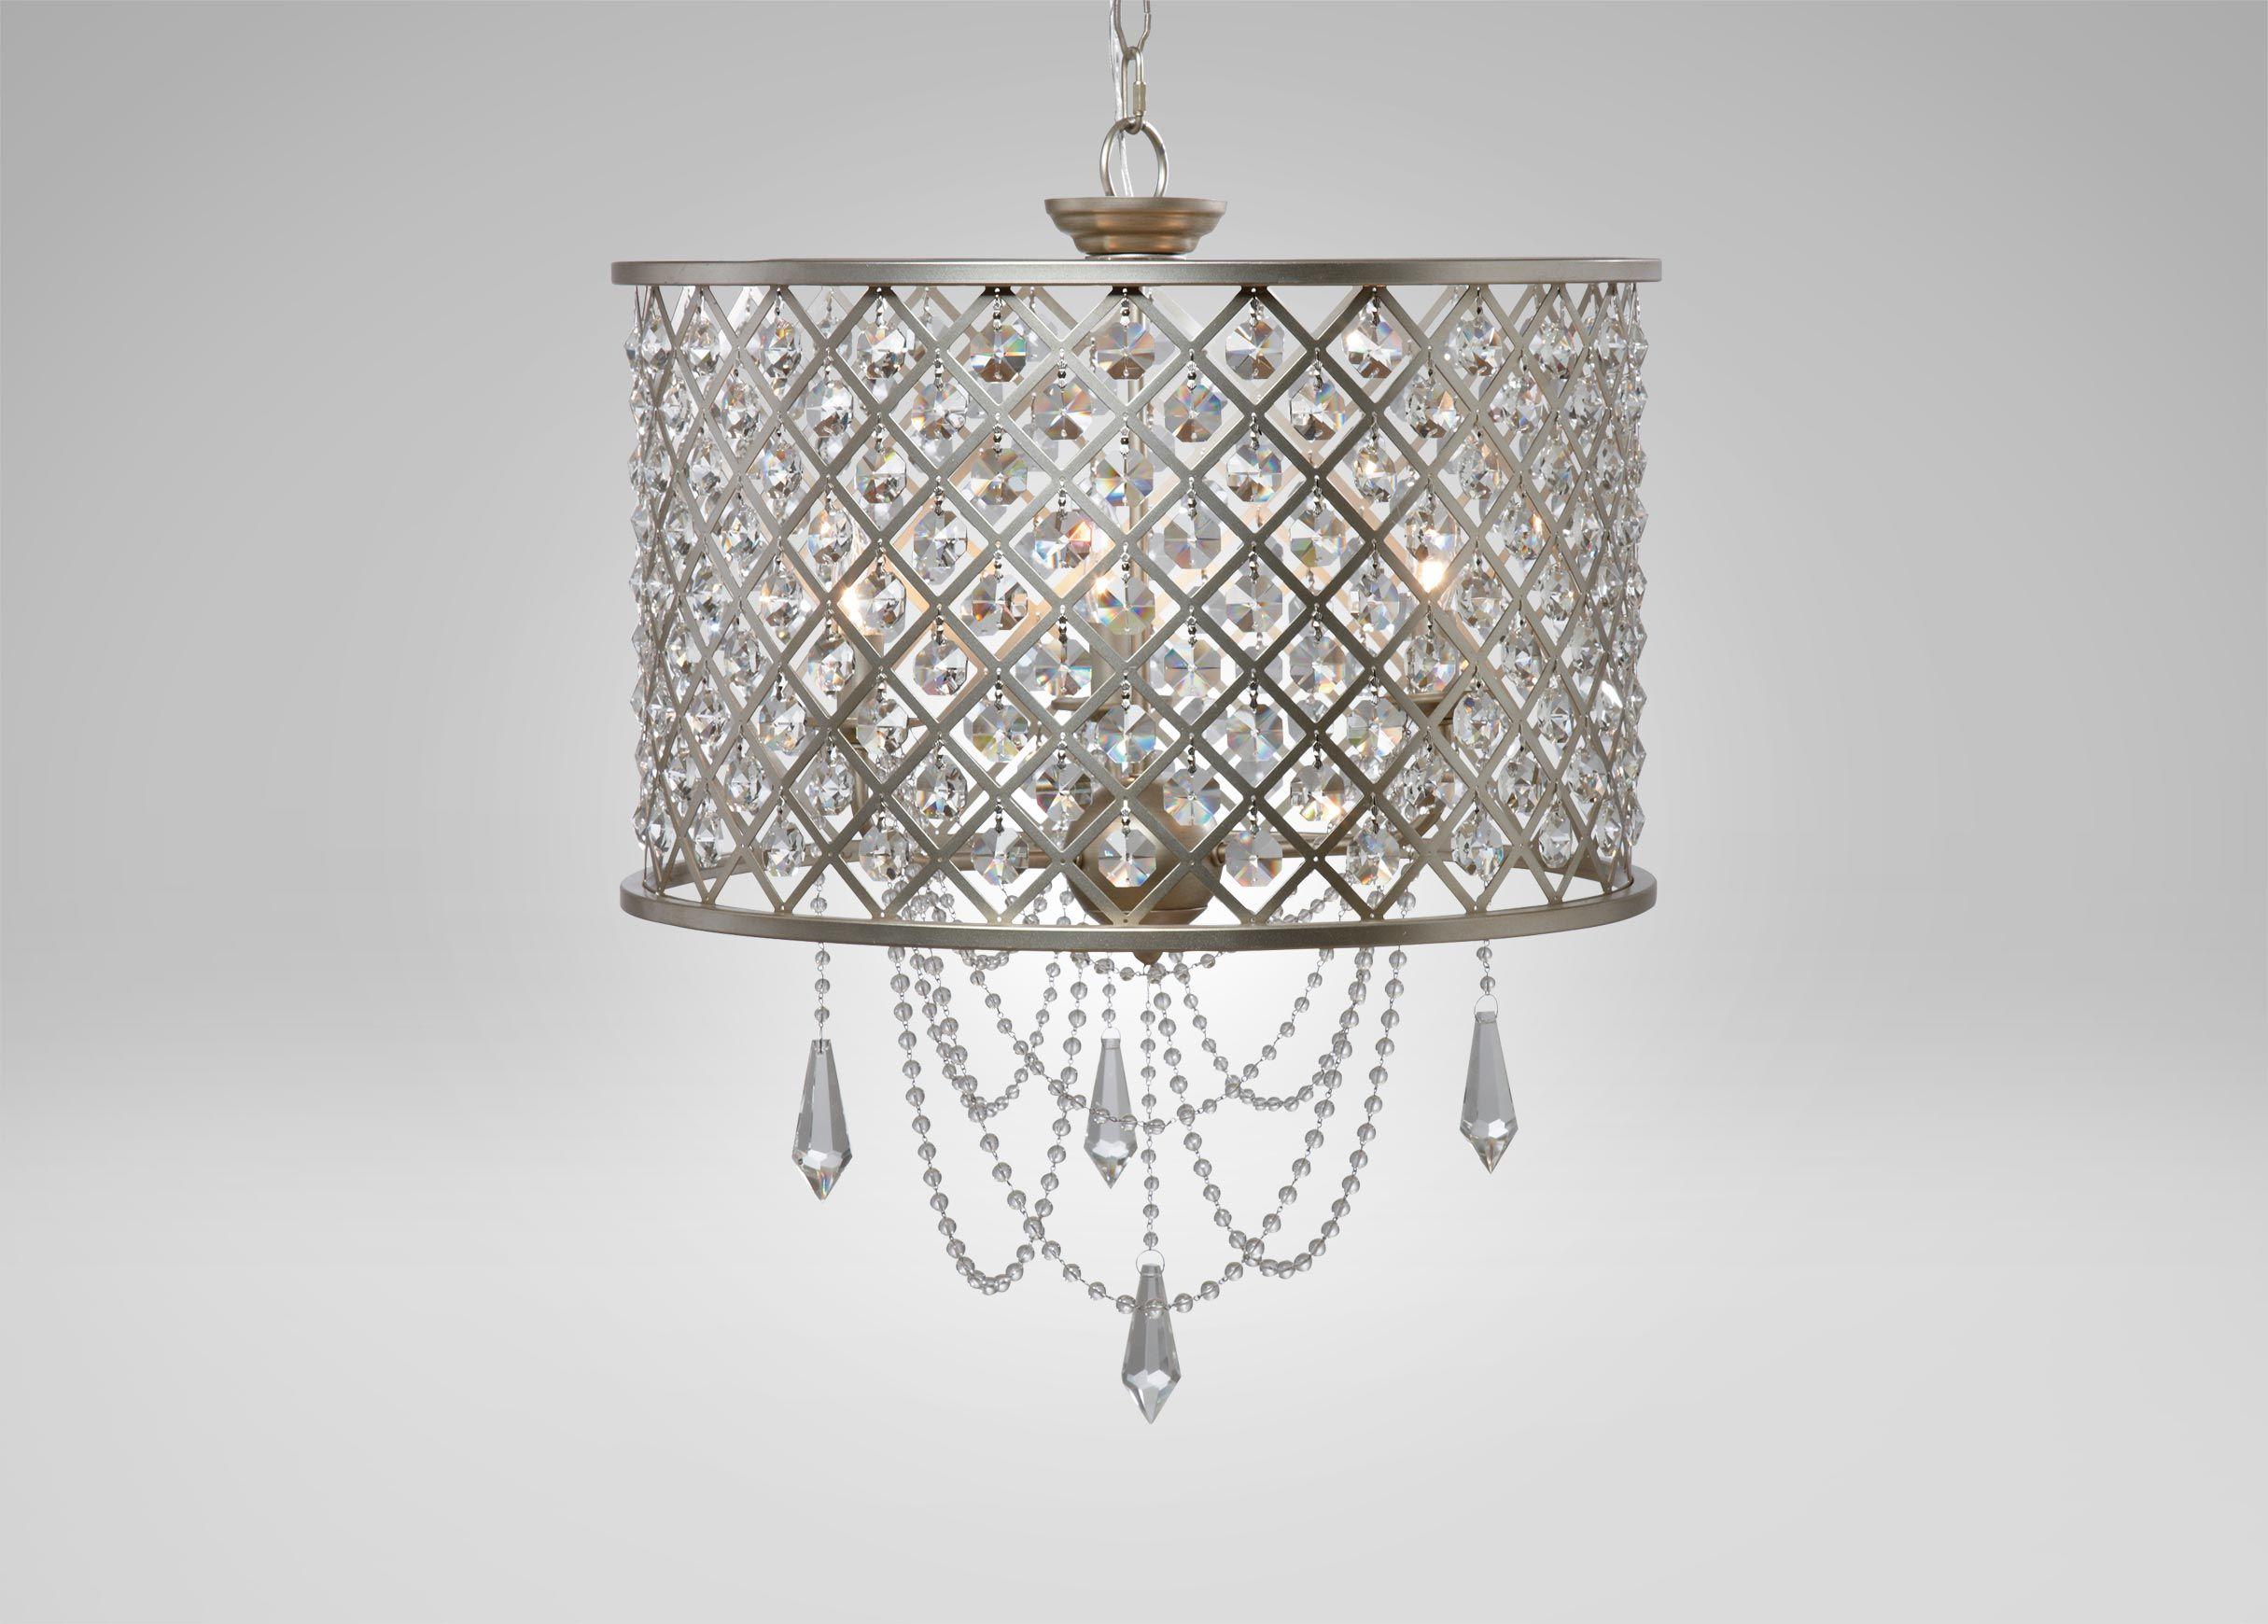 Small antoinette chandelier ethan allen lighting pinterest small antoinette chandelier ethan allen arubaitofo Gallery